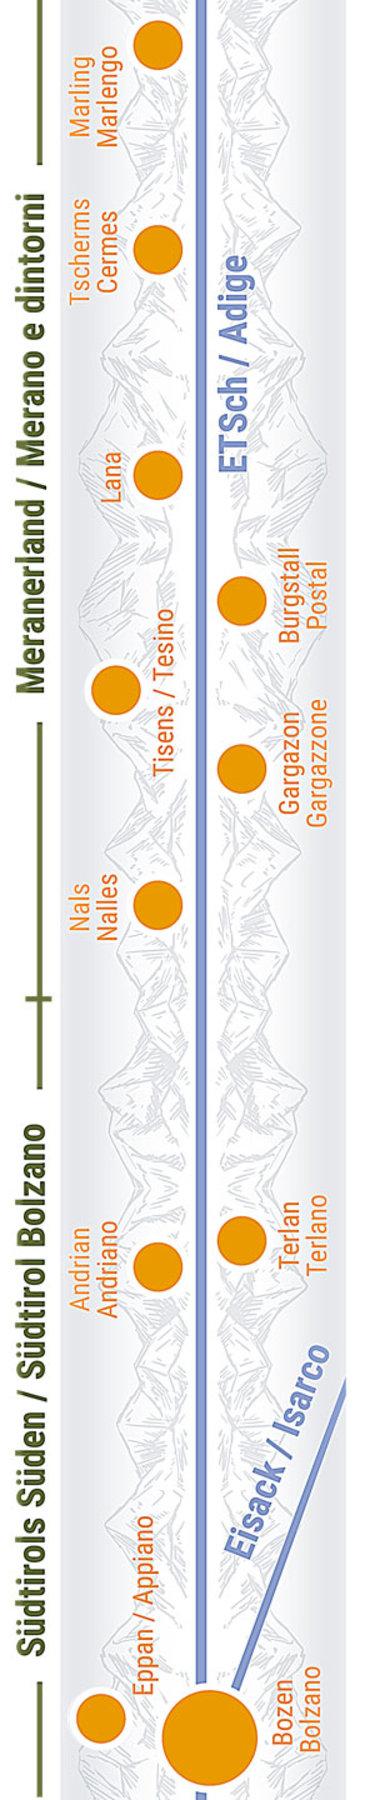 Übersichtskarte rechts Teilabschnitt 26 Meran, Bozen